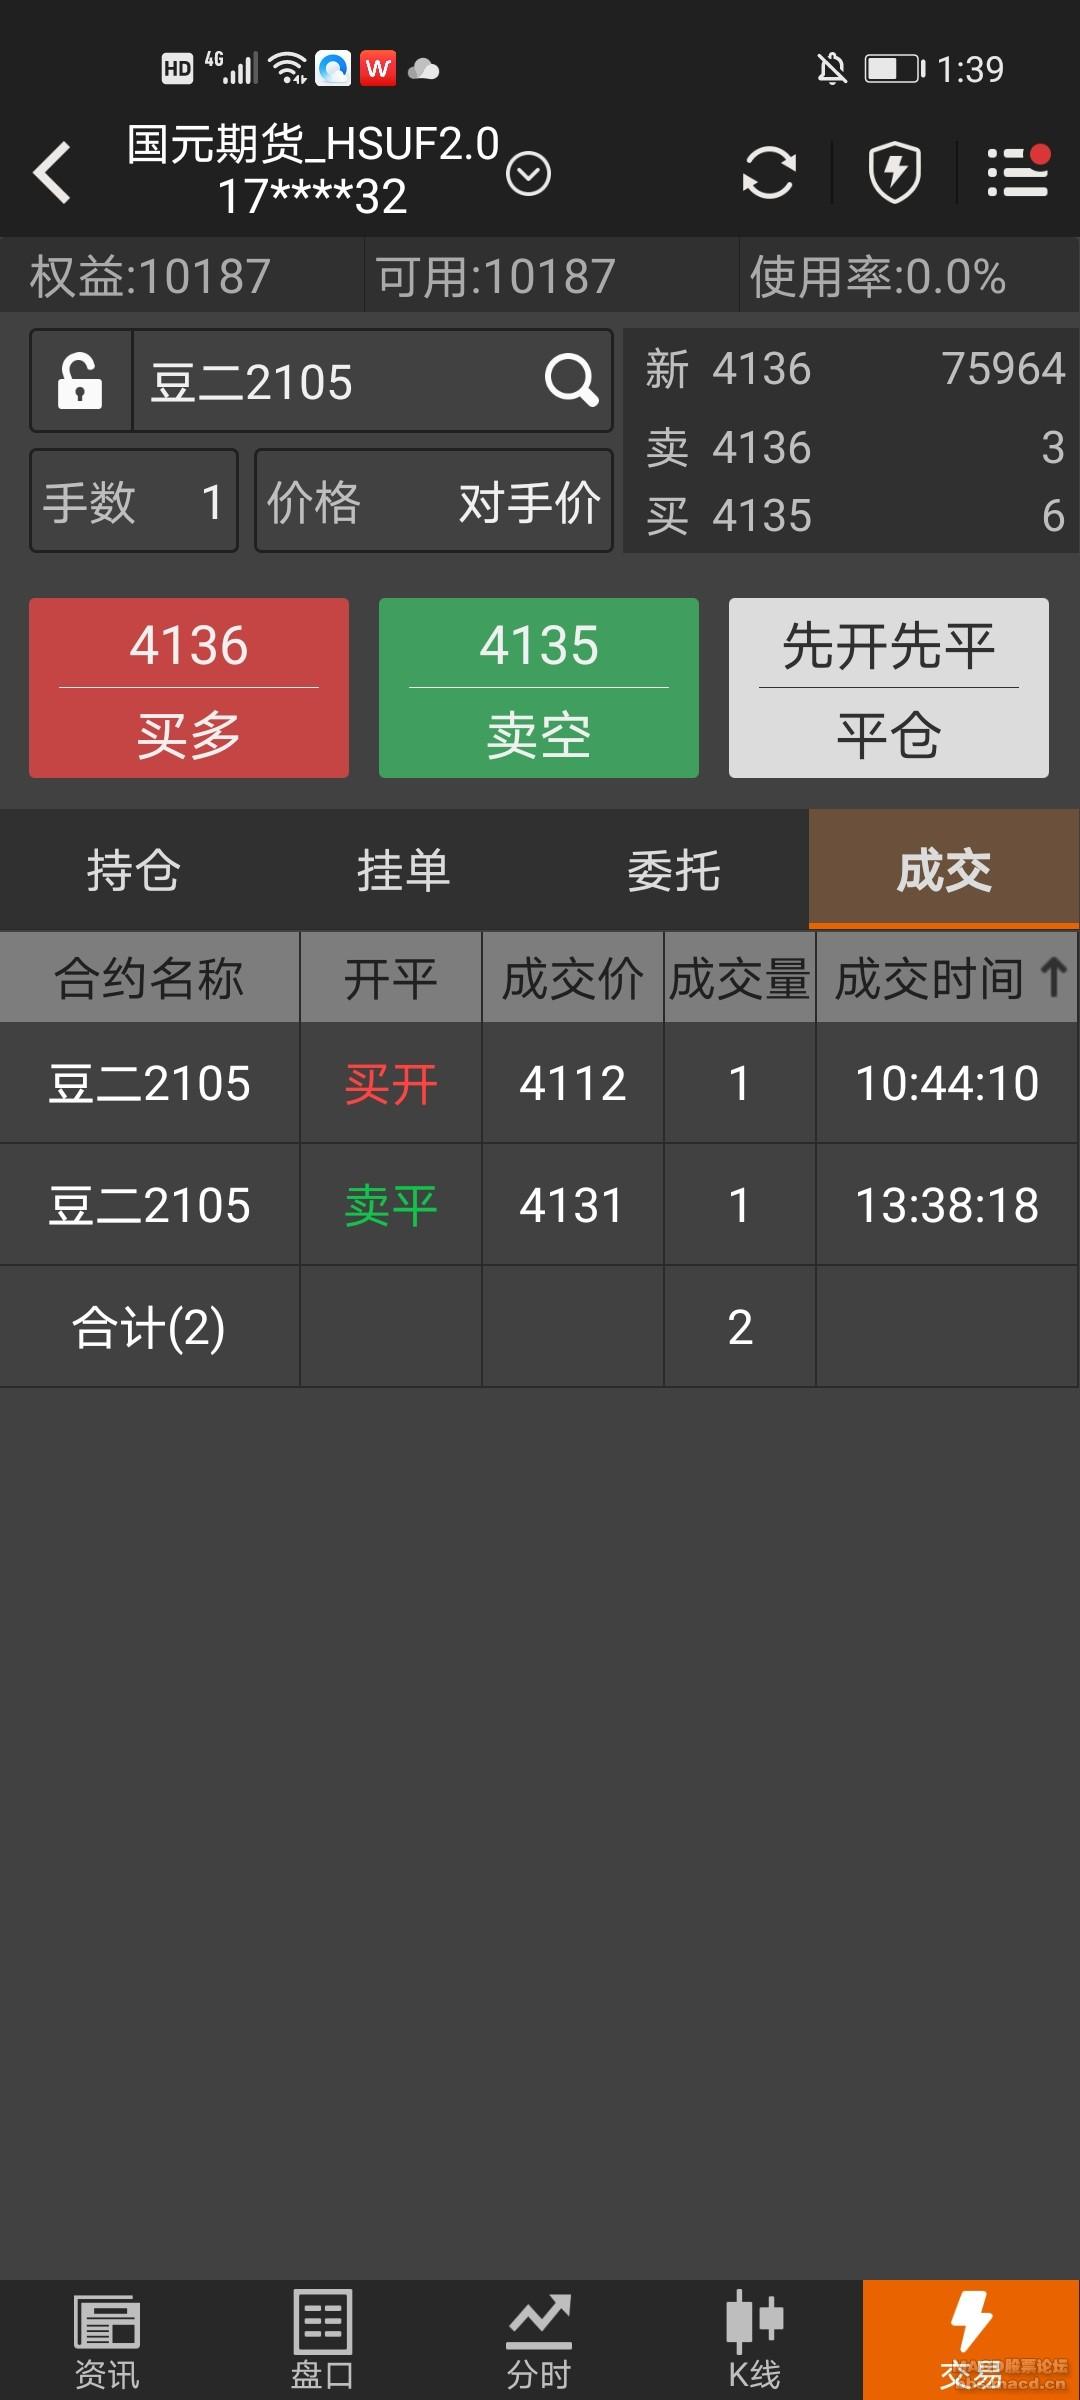 Screenshot_20210401_133905_com.wenhua.bamboo.jpg